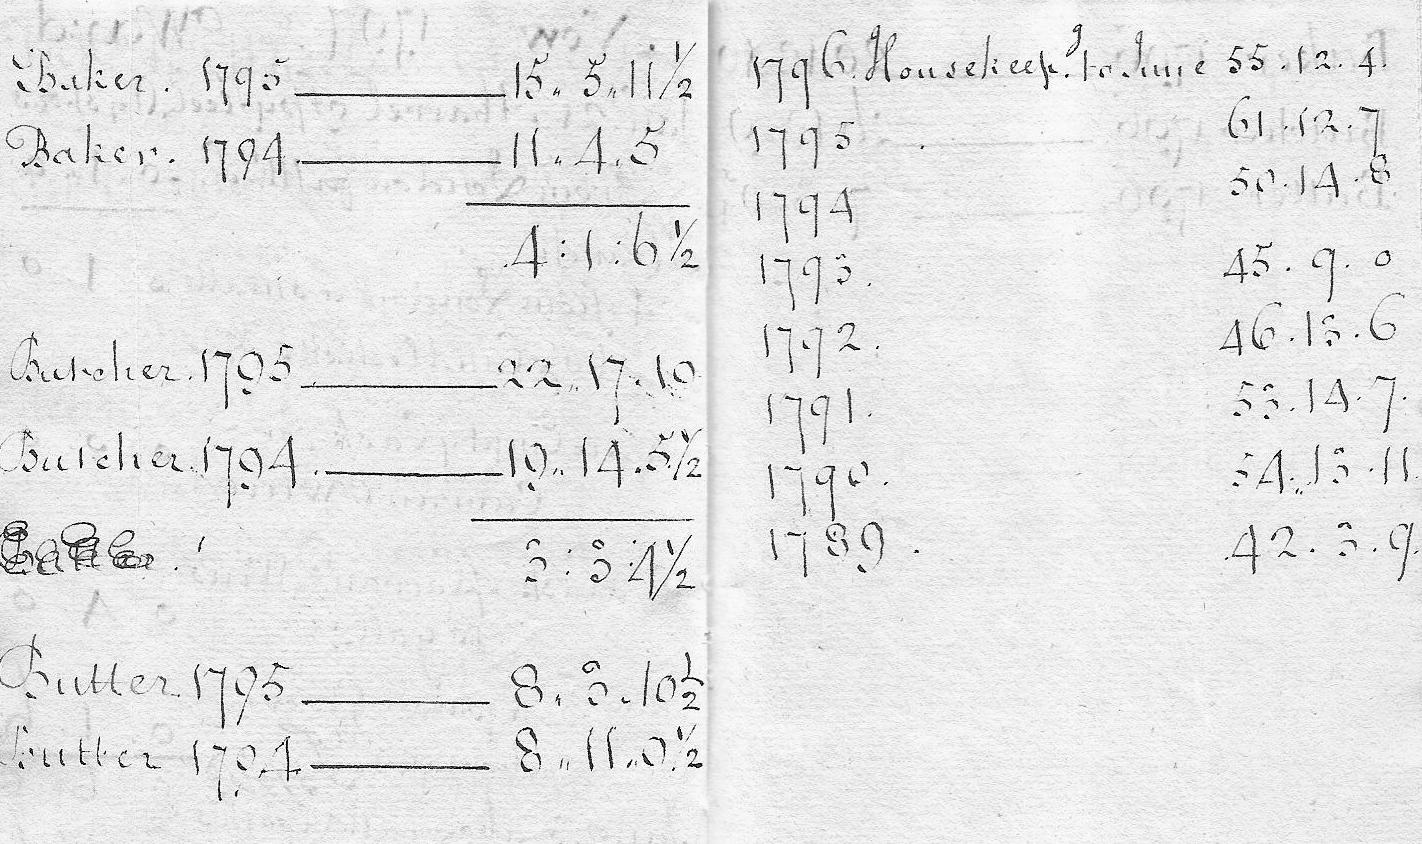 1794-5 comparison household expenses 001